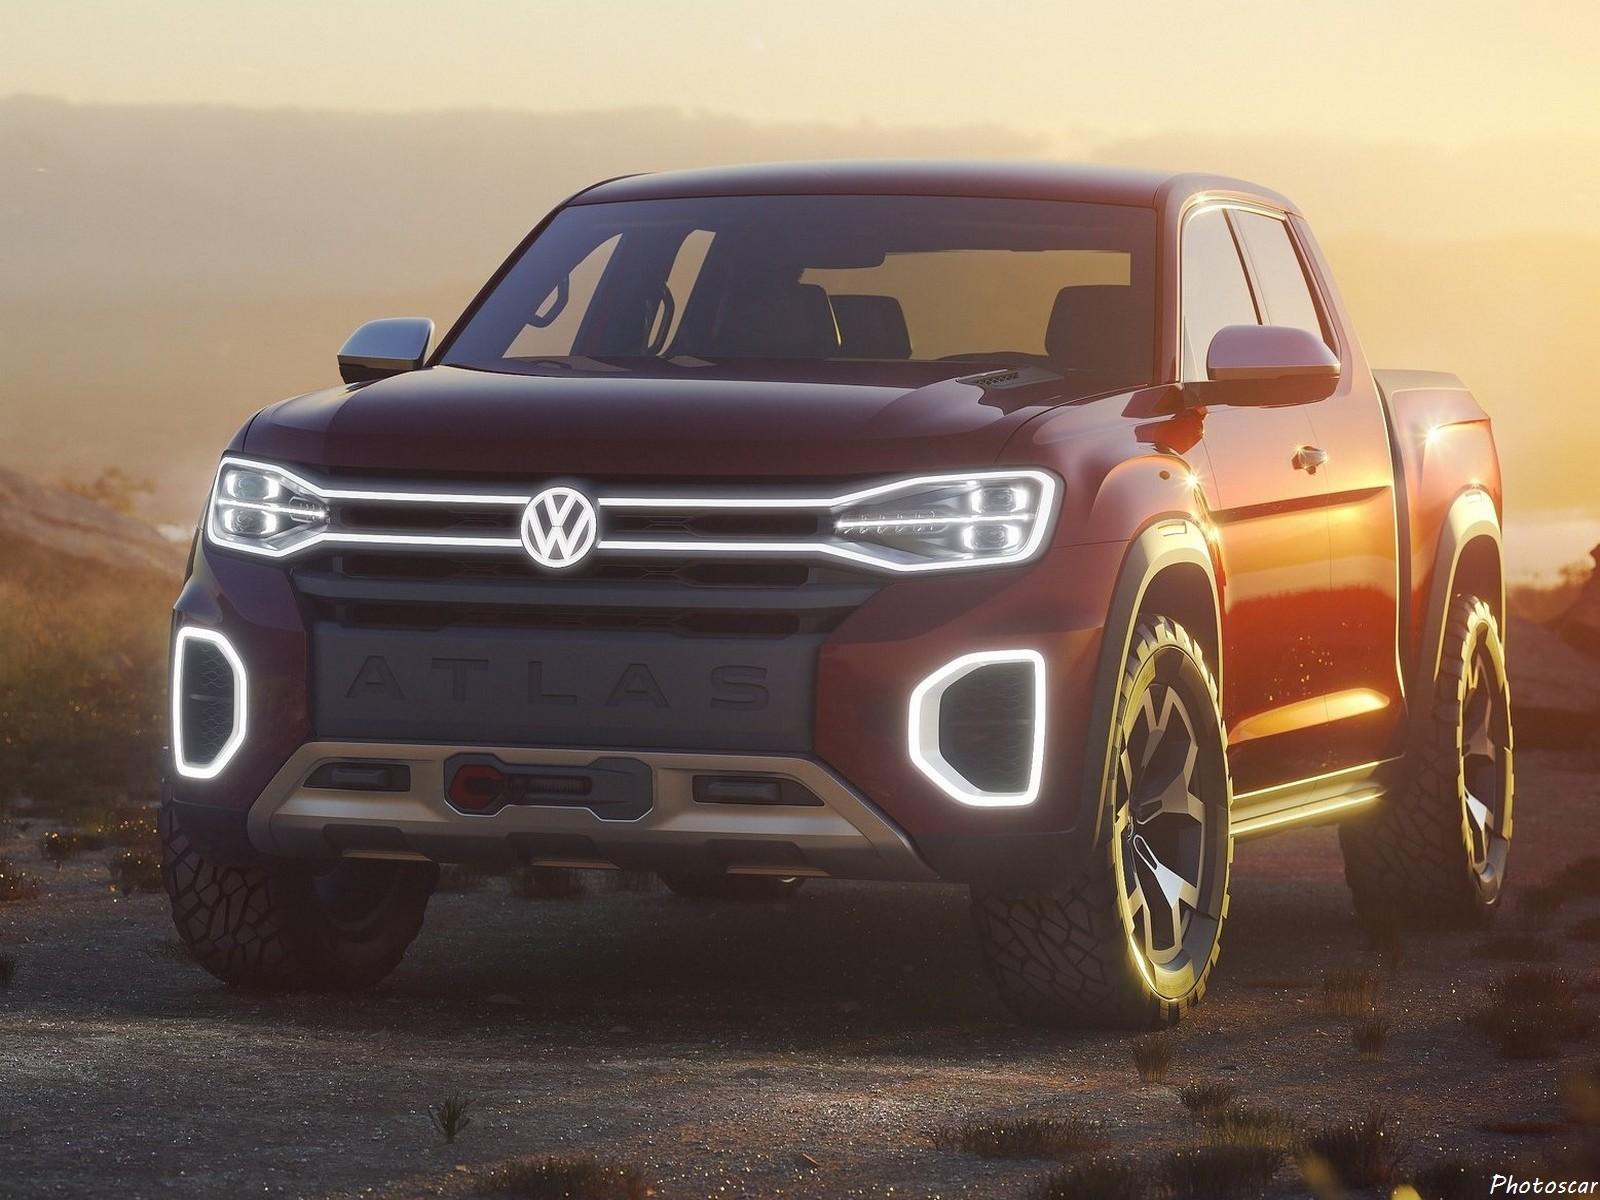 Volkswagen Atlas Tanoak 2018 Un Pick Up A La Sauce Amricaine